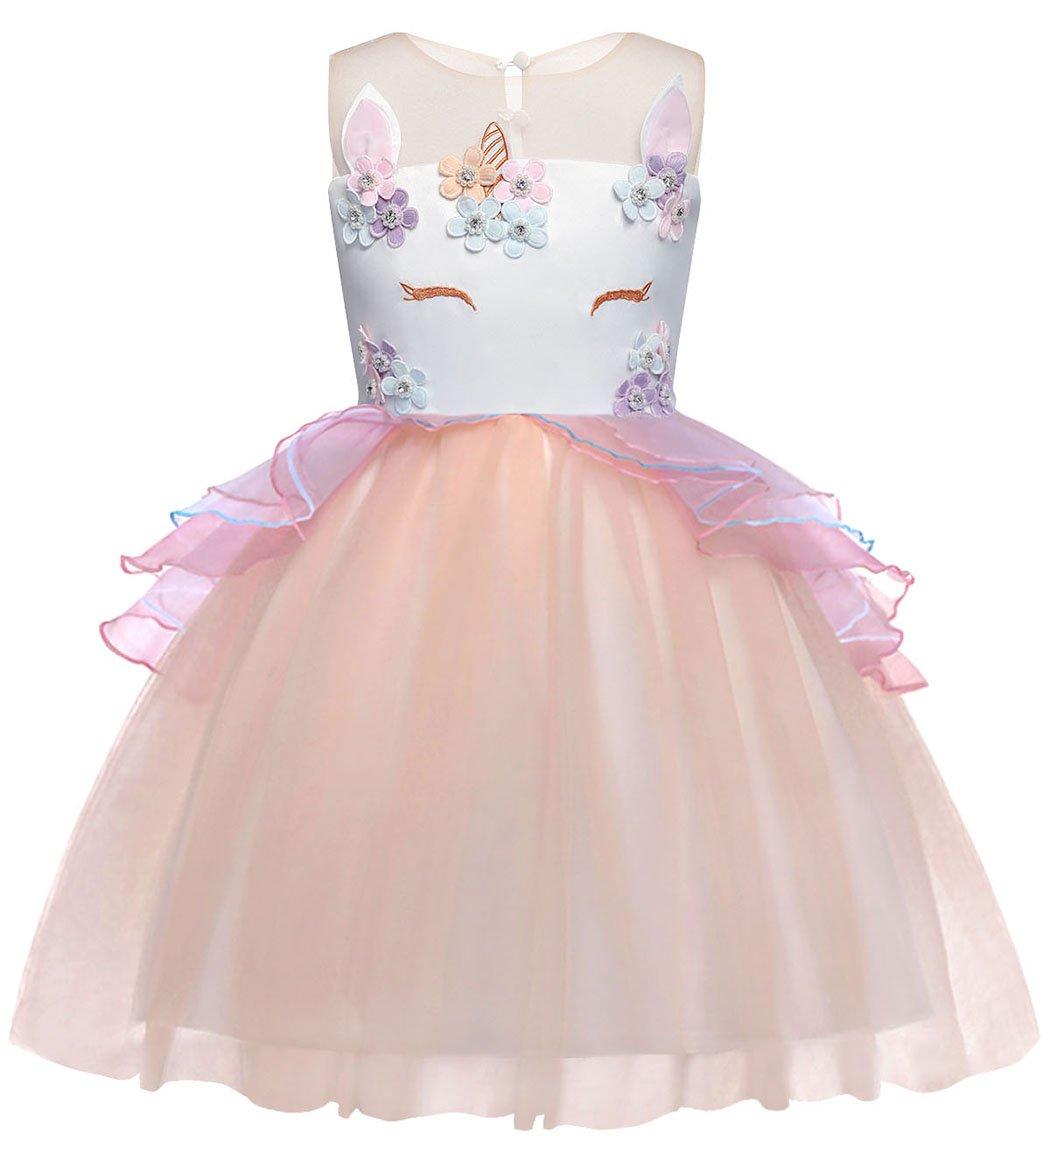 AmzBarley Girls Unicorn Dress Princess Costume Tulle Flower Cosplay Party G017-CA